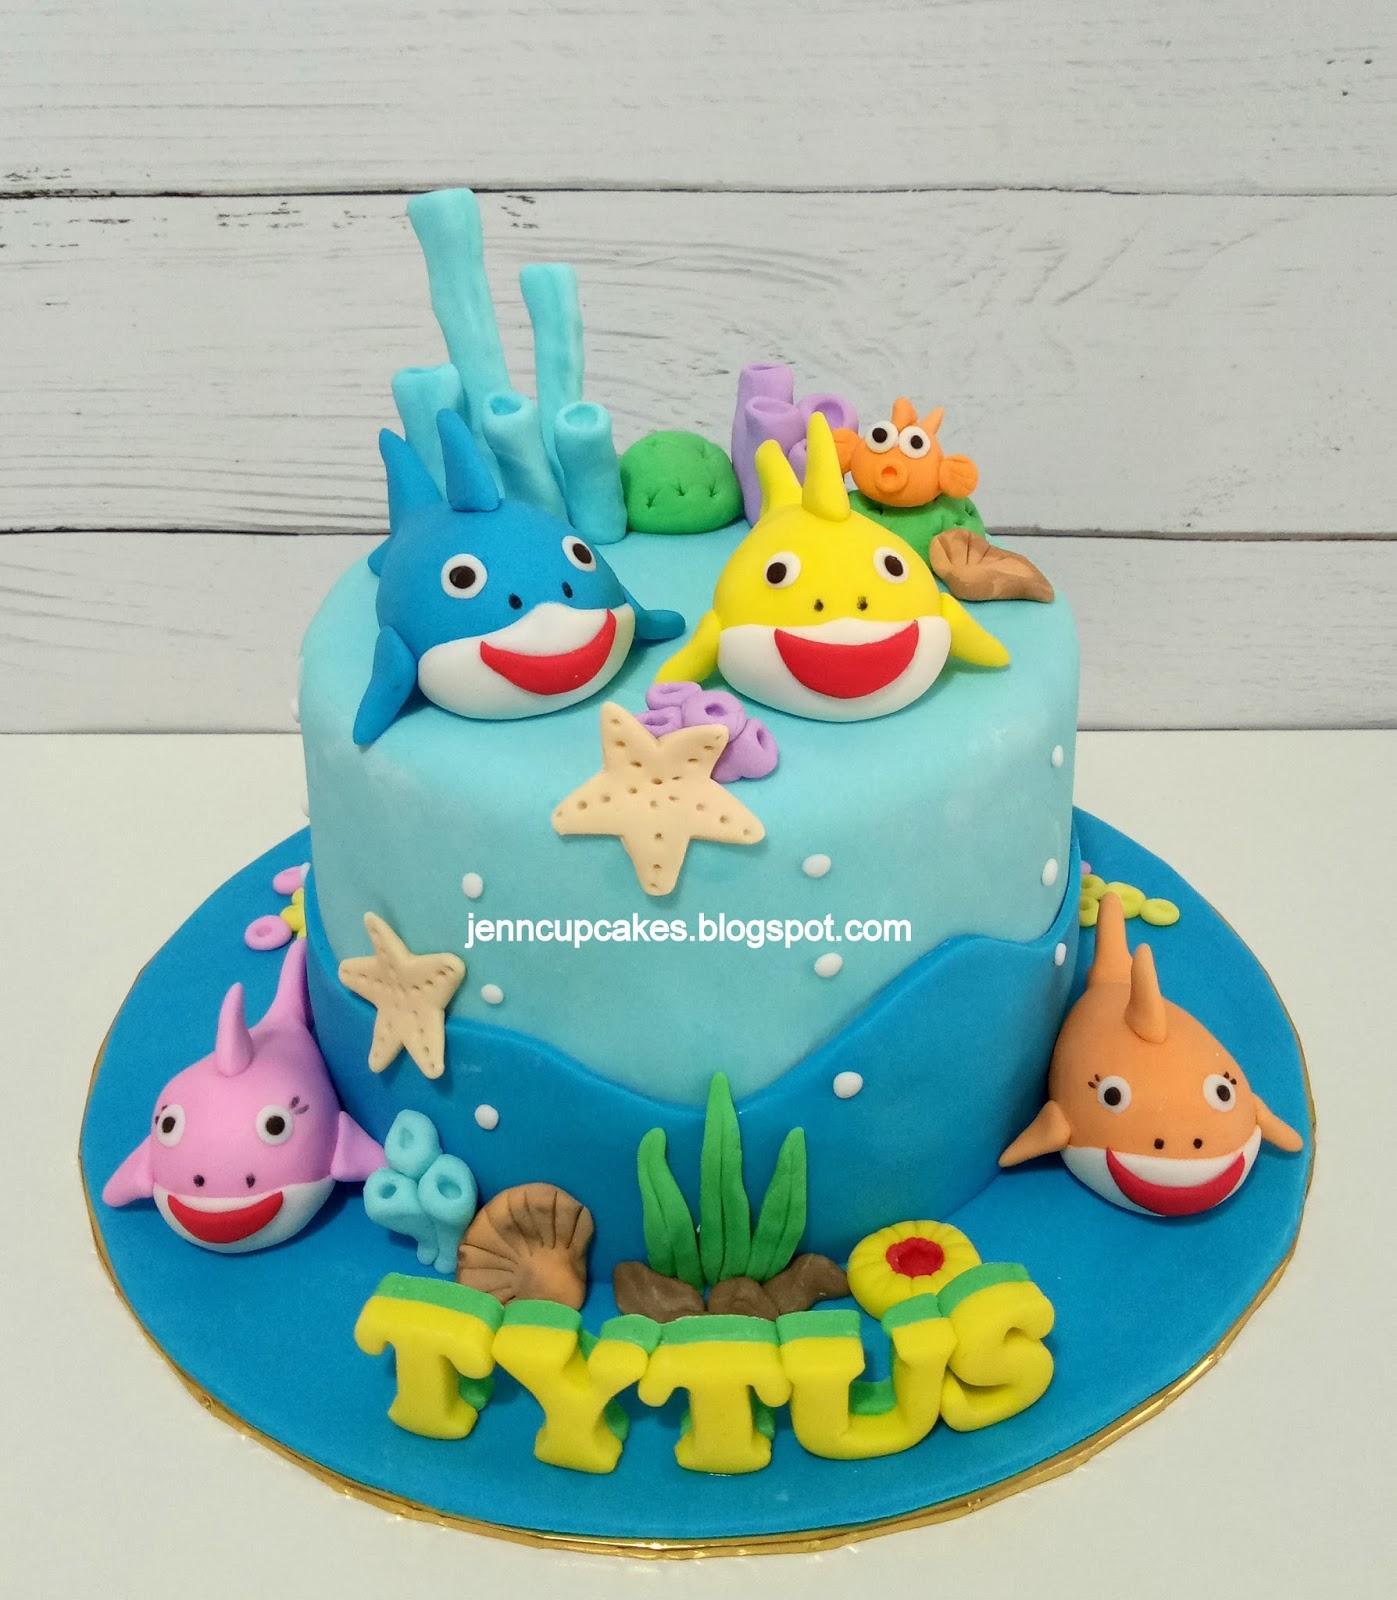 Jenn Cupcakes Muffins Baby Shark Cake Cupcakes